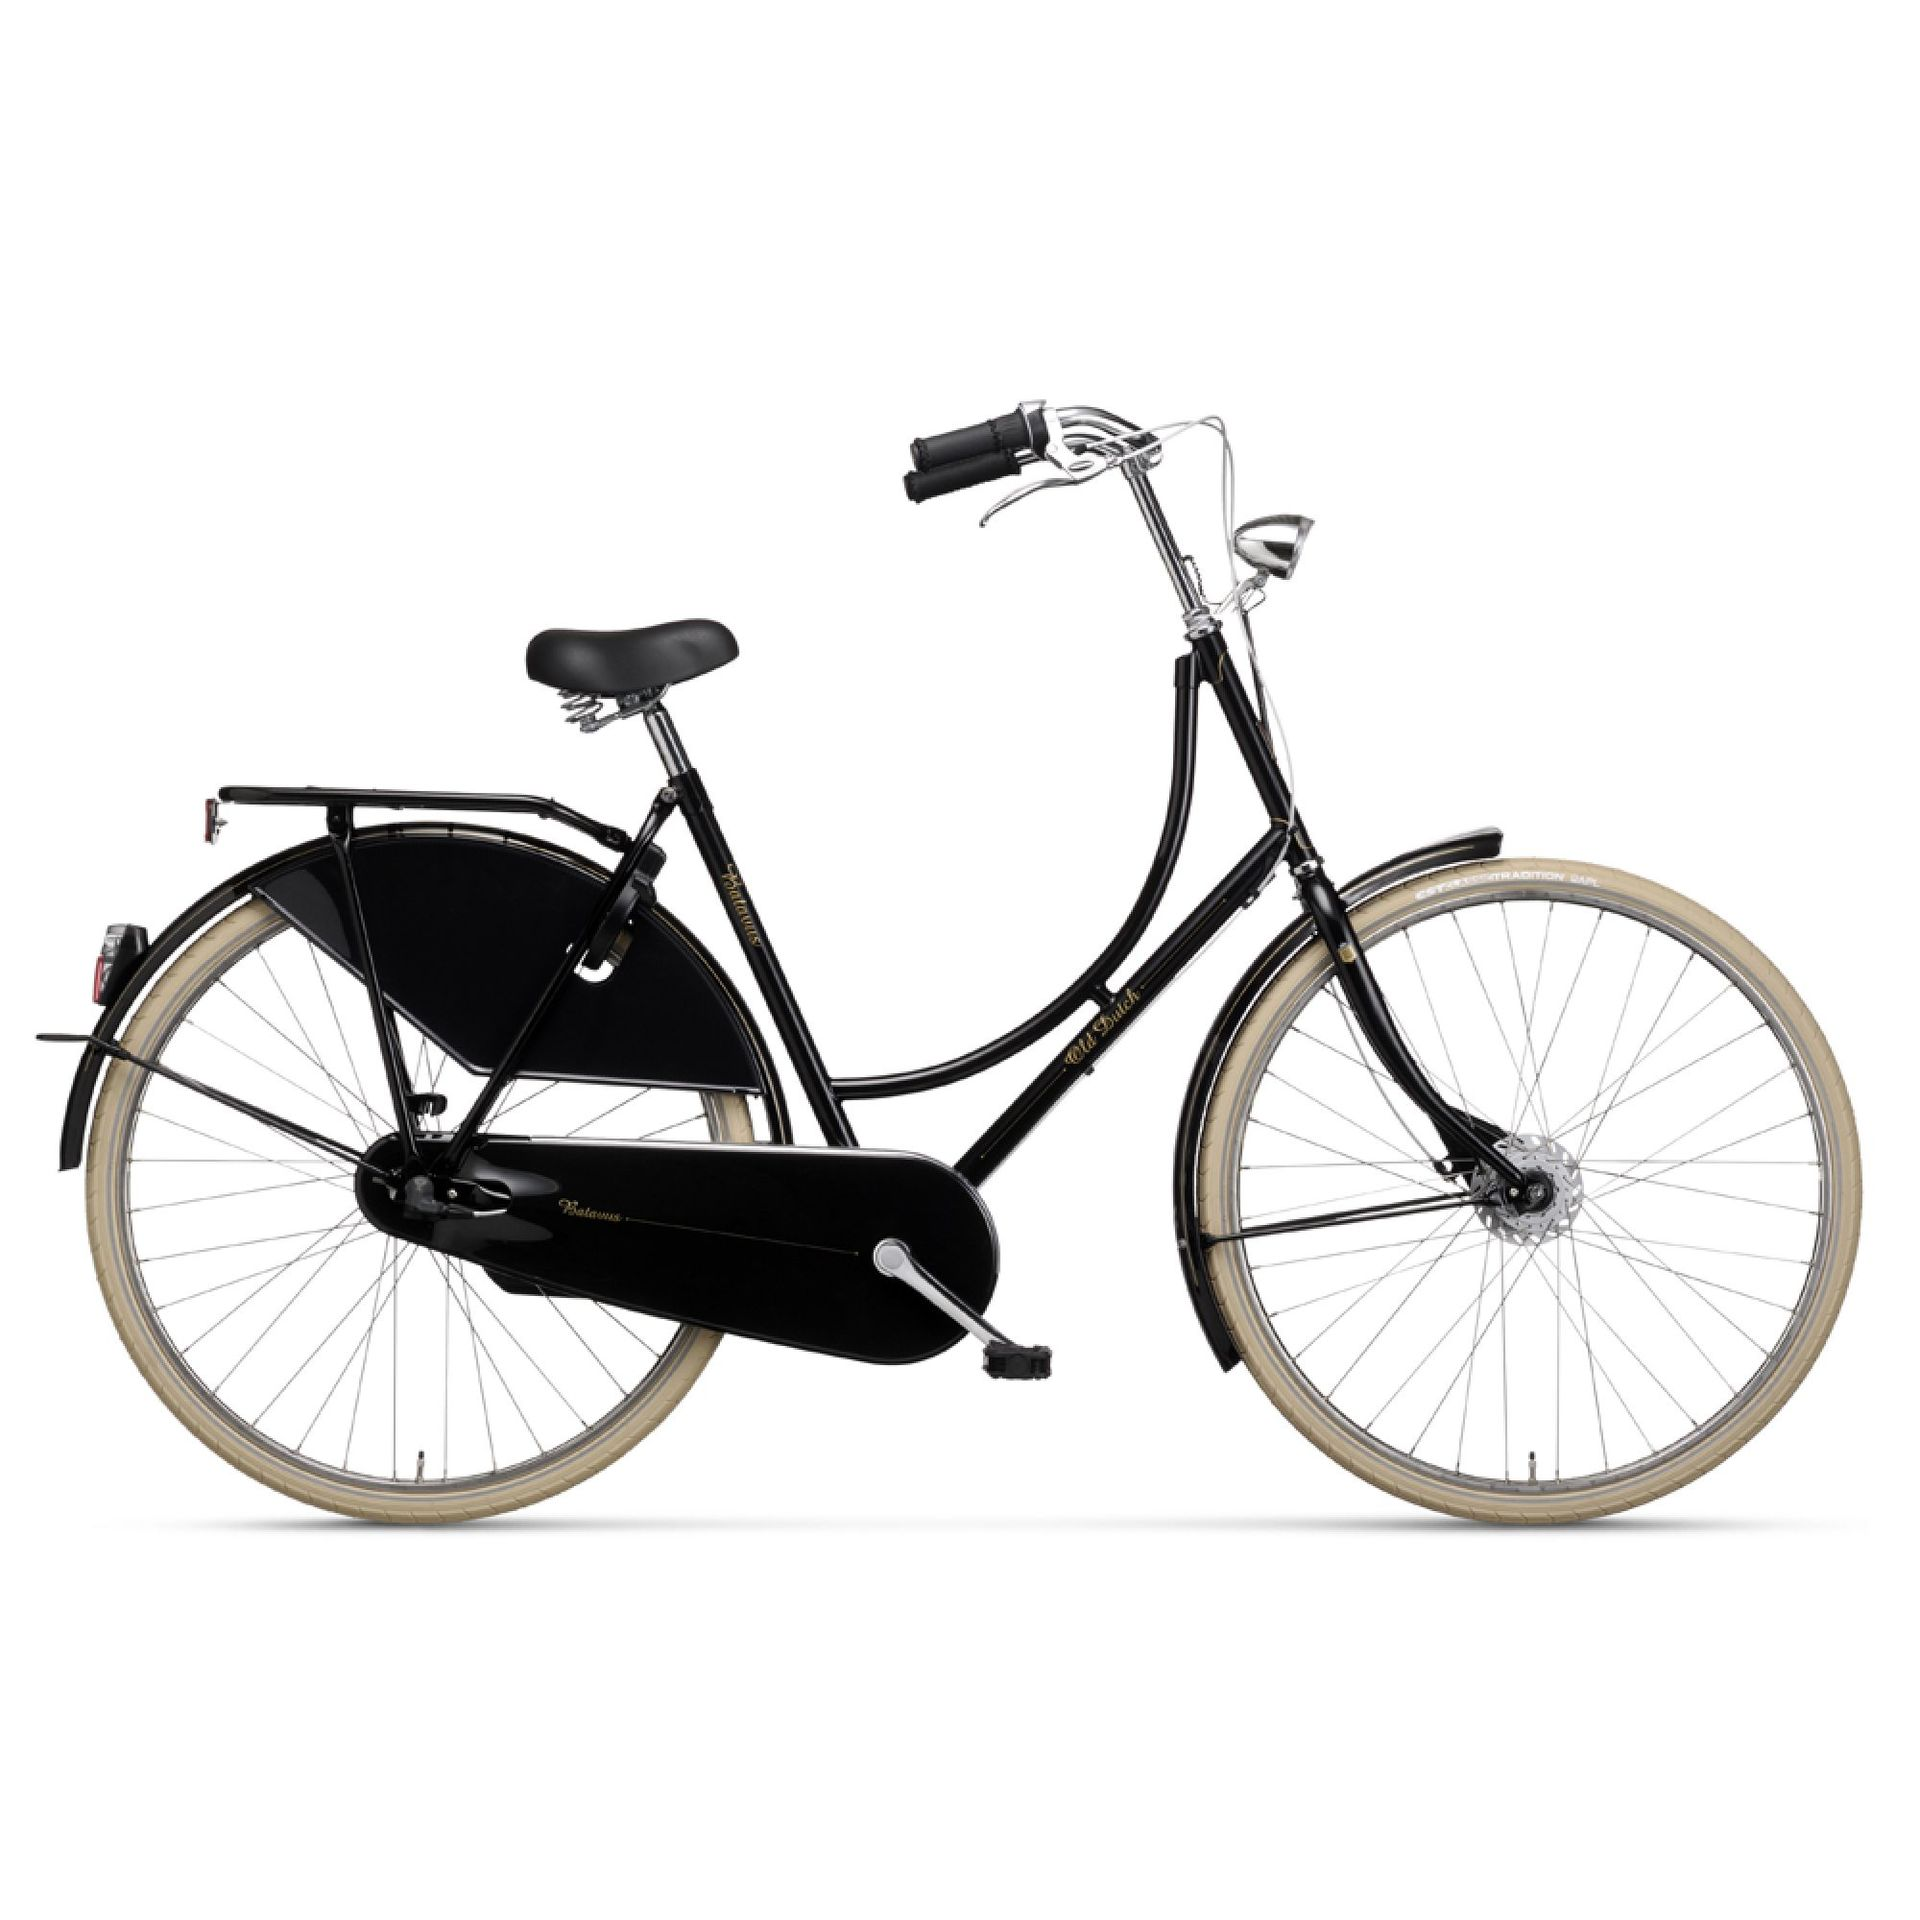 Rower Batavus Old Dutch 3 czarny